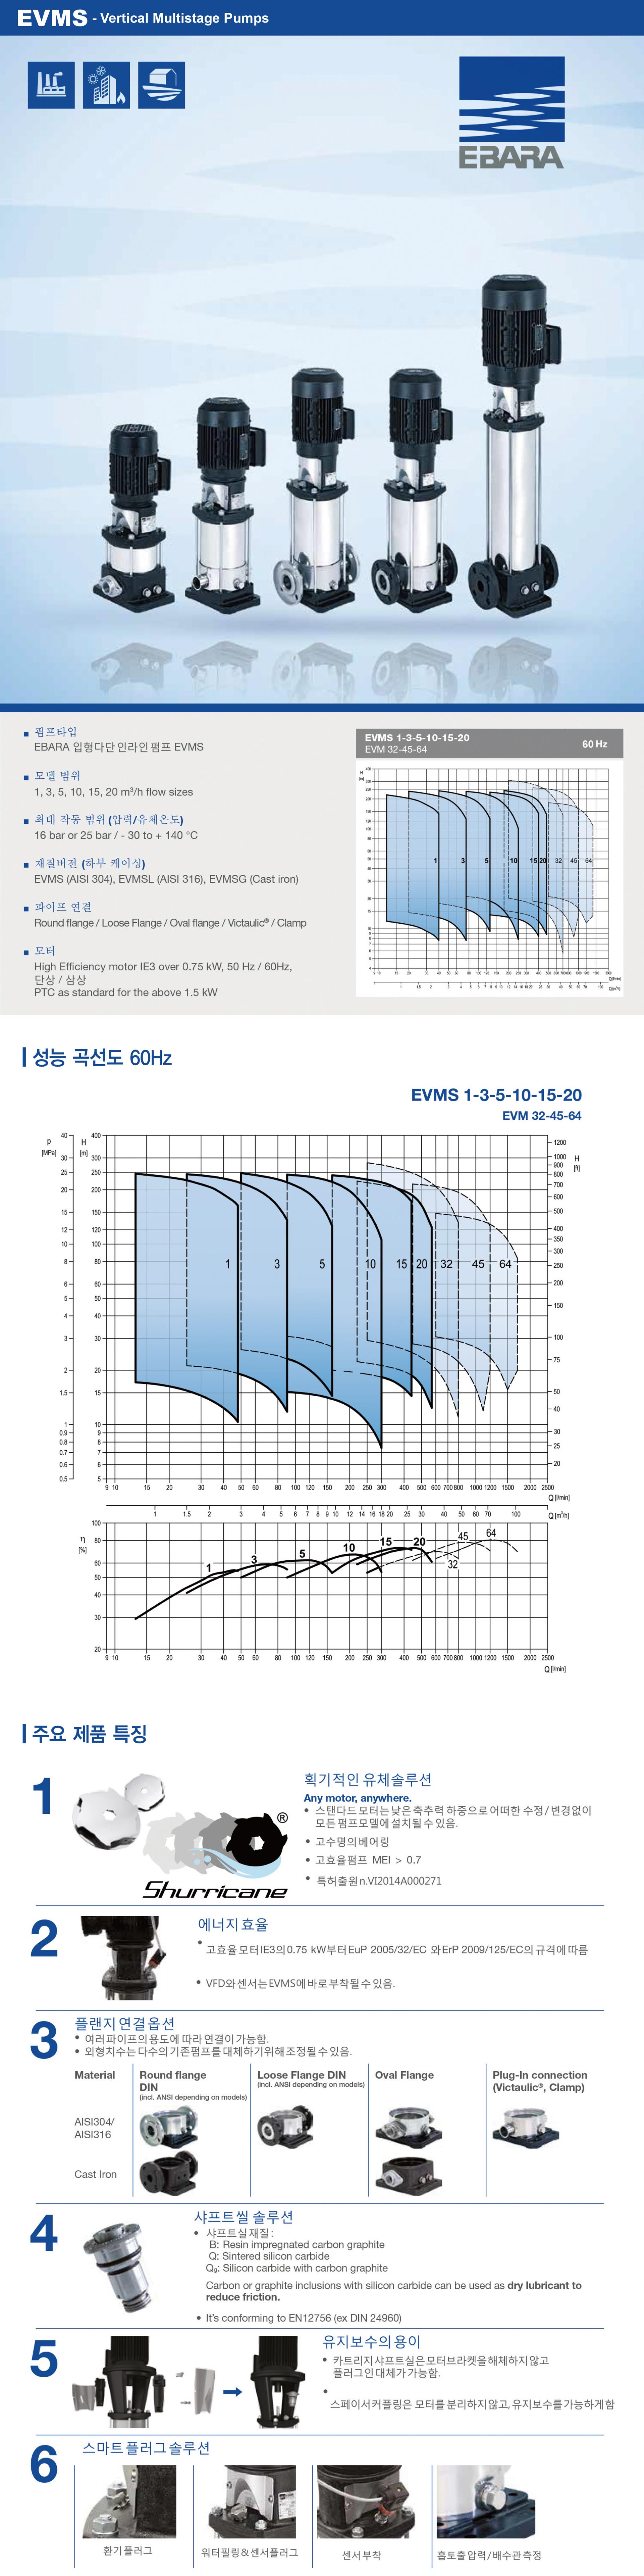 01-EVMS작업.jpg